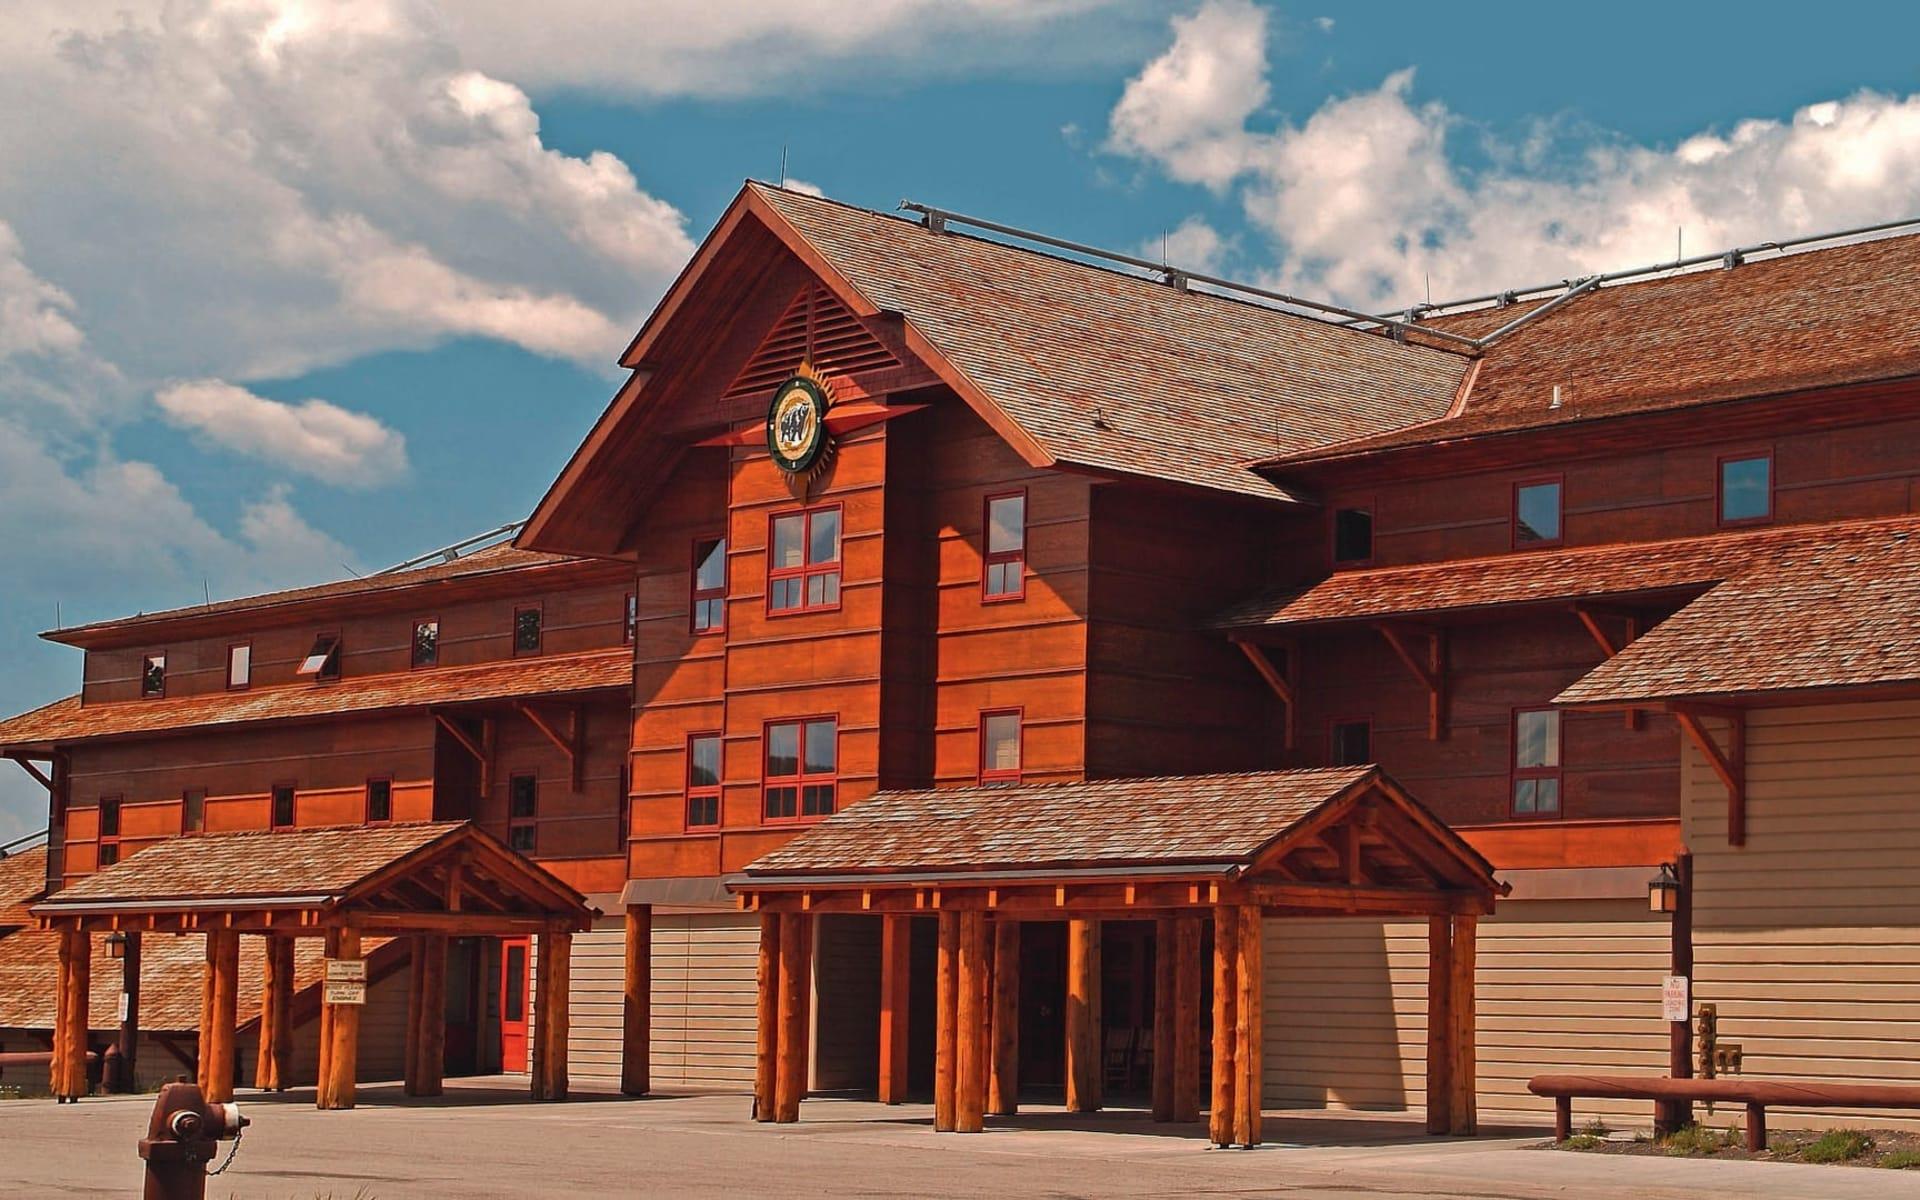 Old Faithful Snow Lodge in Yellowstone National Park: exterior wyoming yellowstone nationalpark lodge